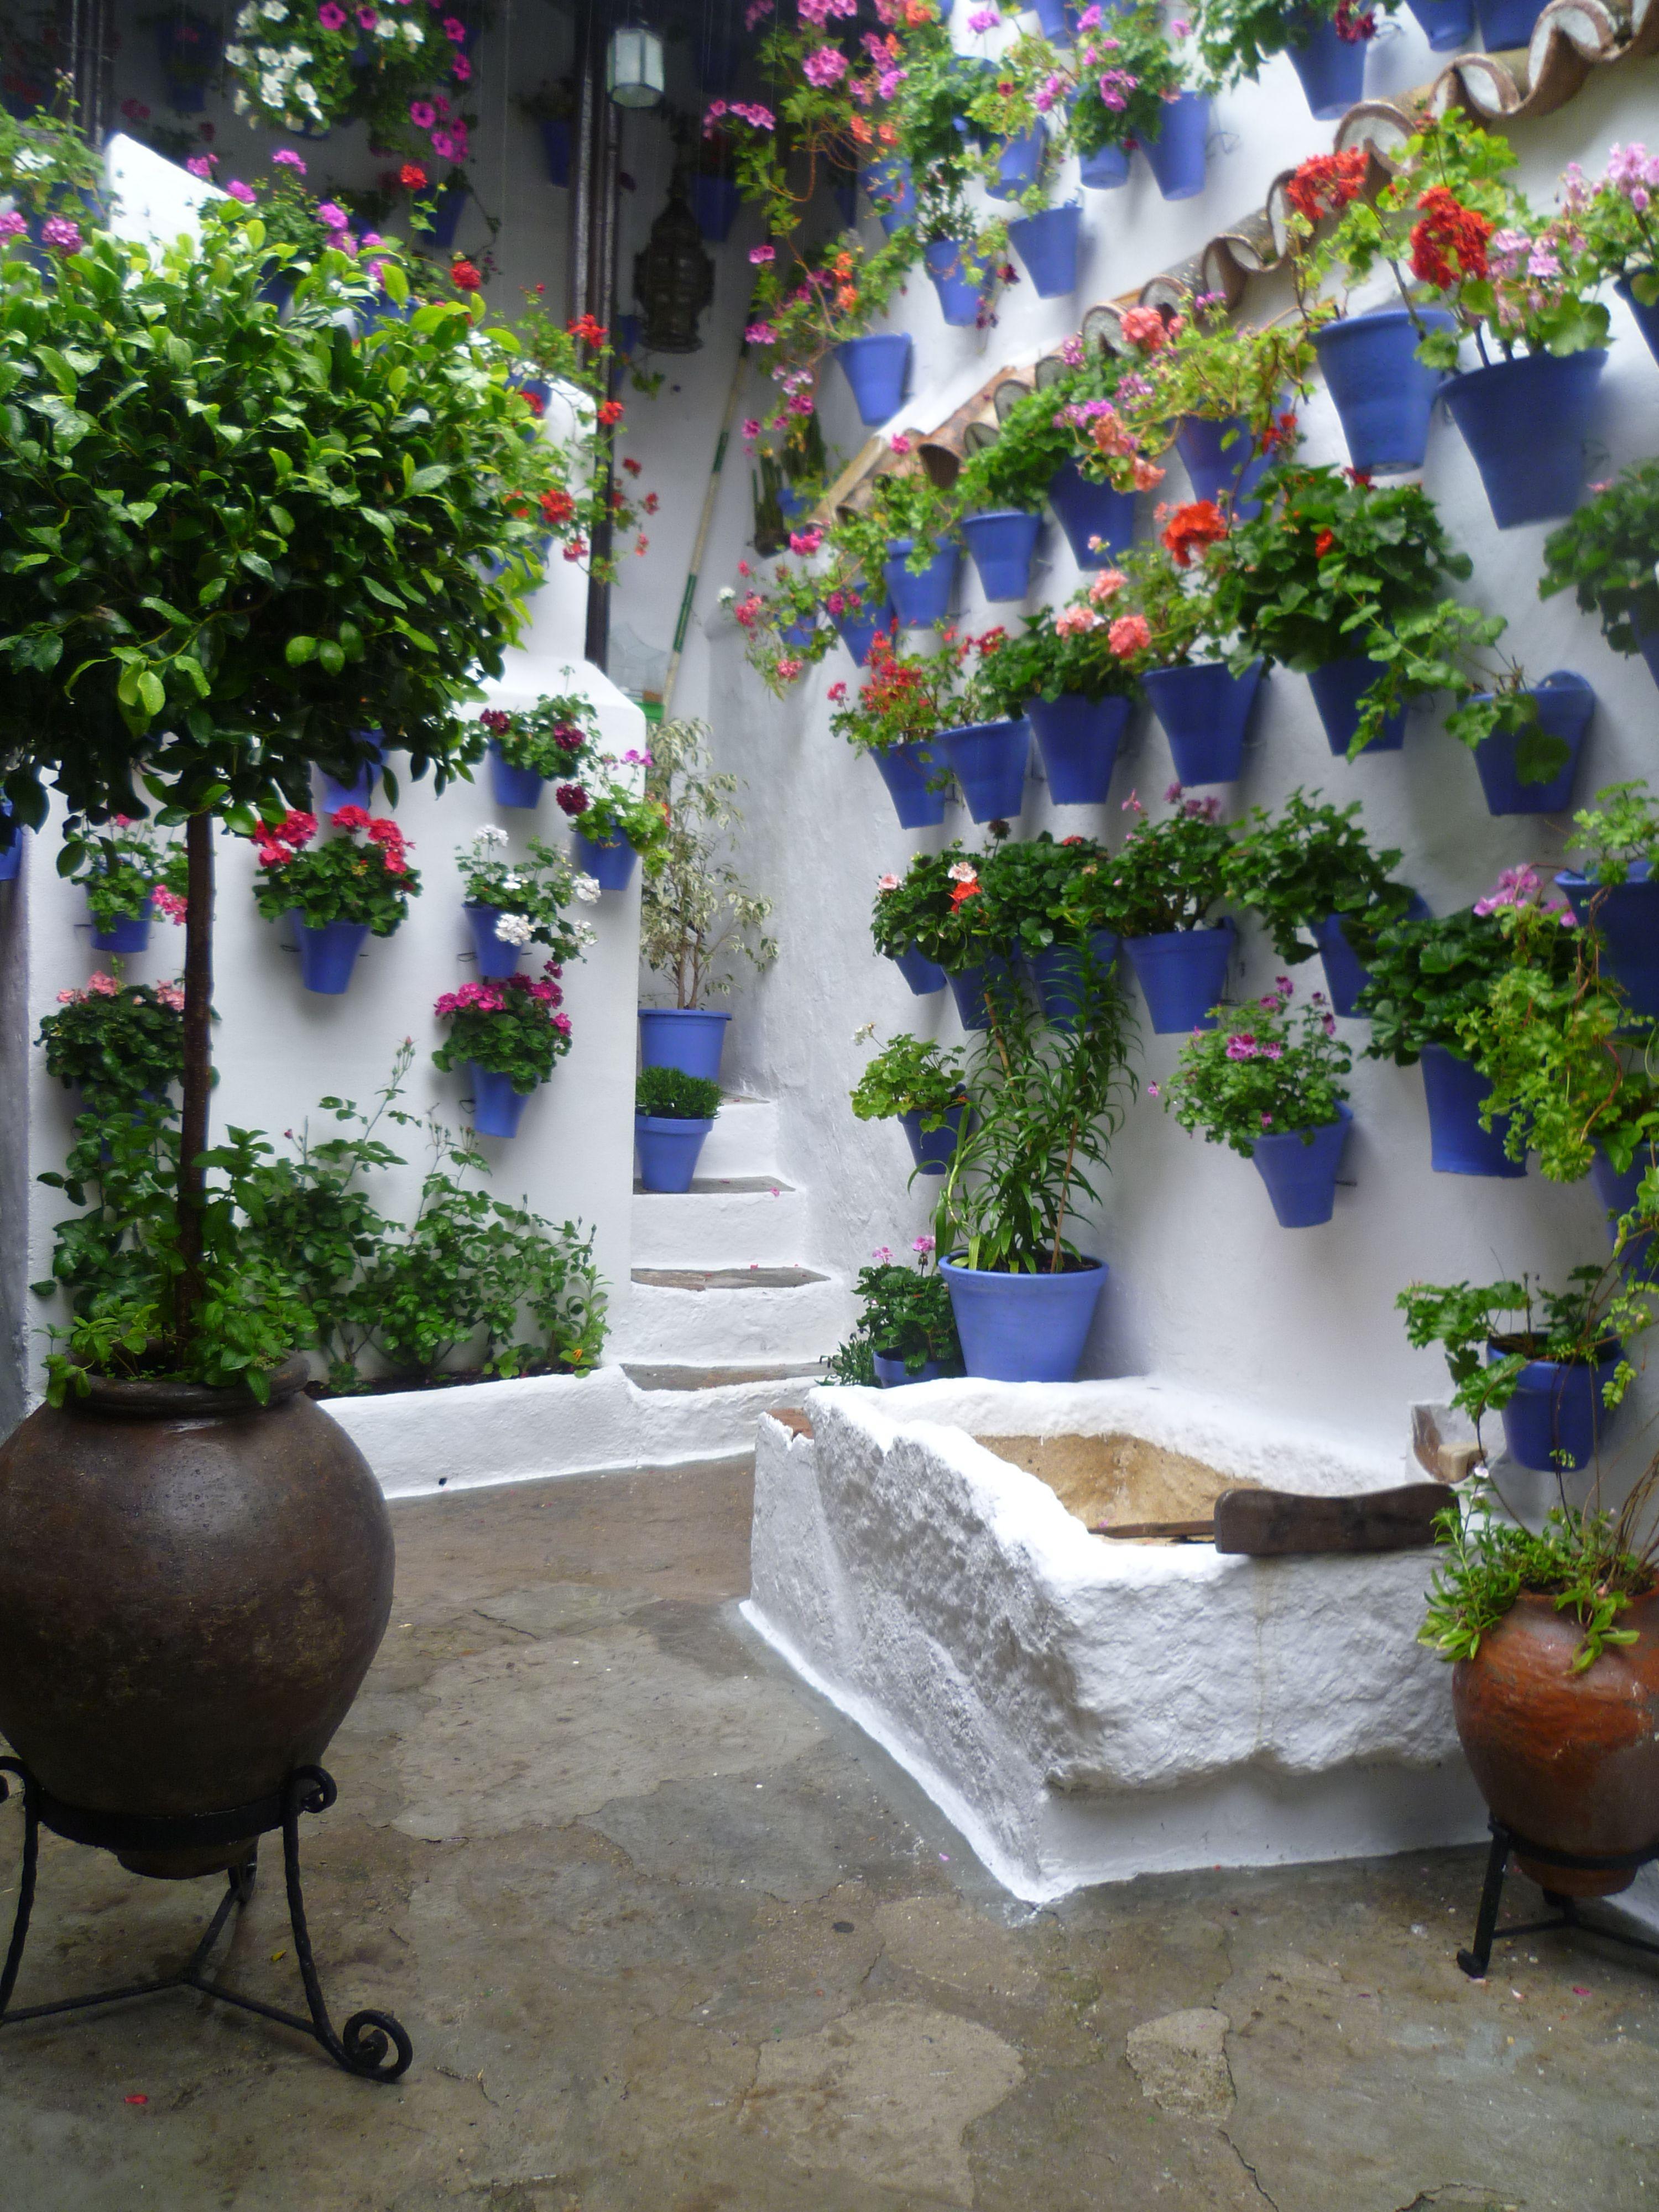 Los patios cordobeses patios andaluces espa a for Exteriores espana